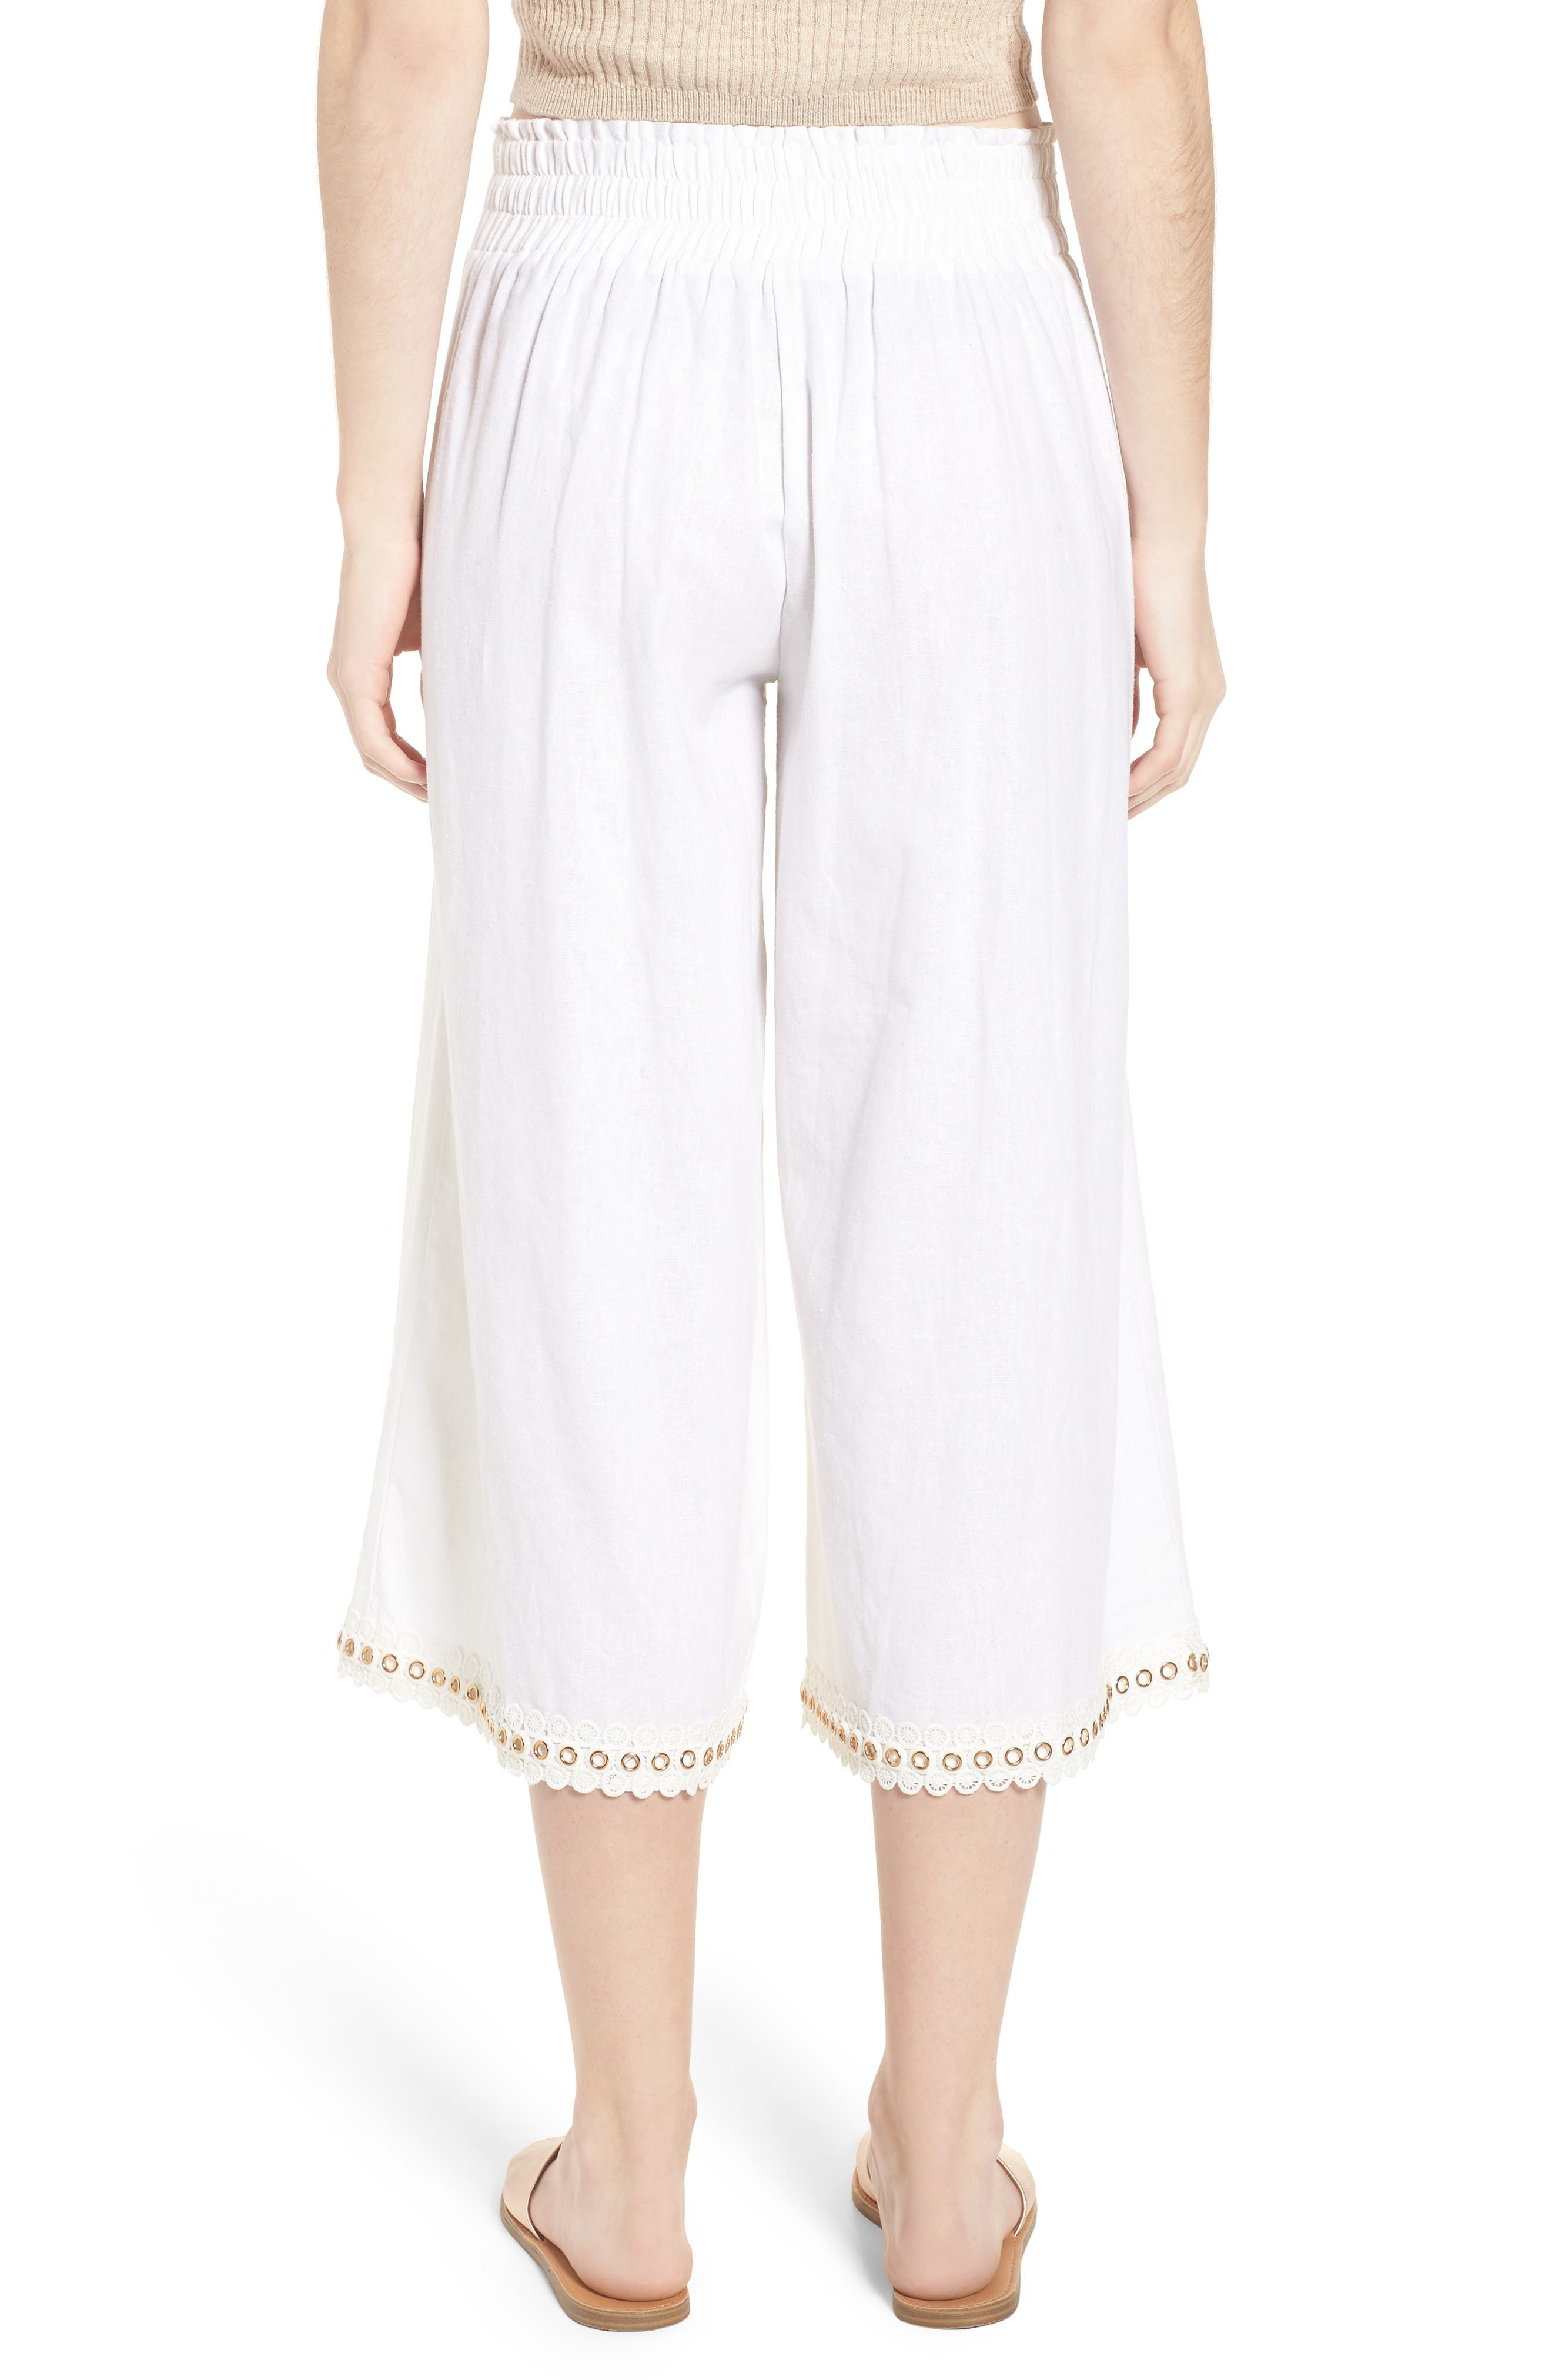 Imara Linen Blend Pants,                             Alternate thumbnail 2, color,                             White